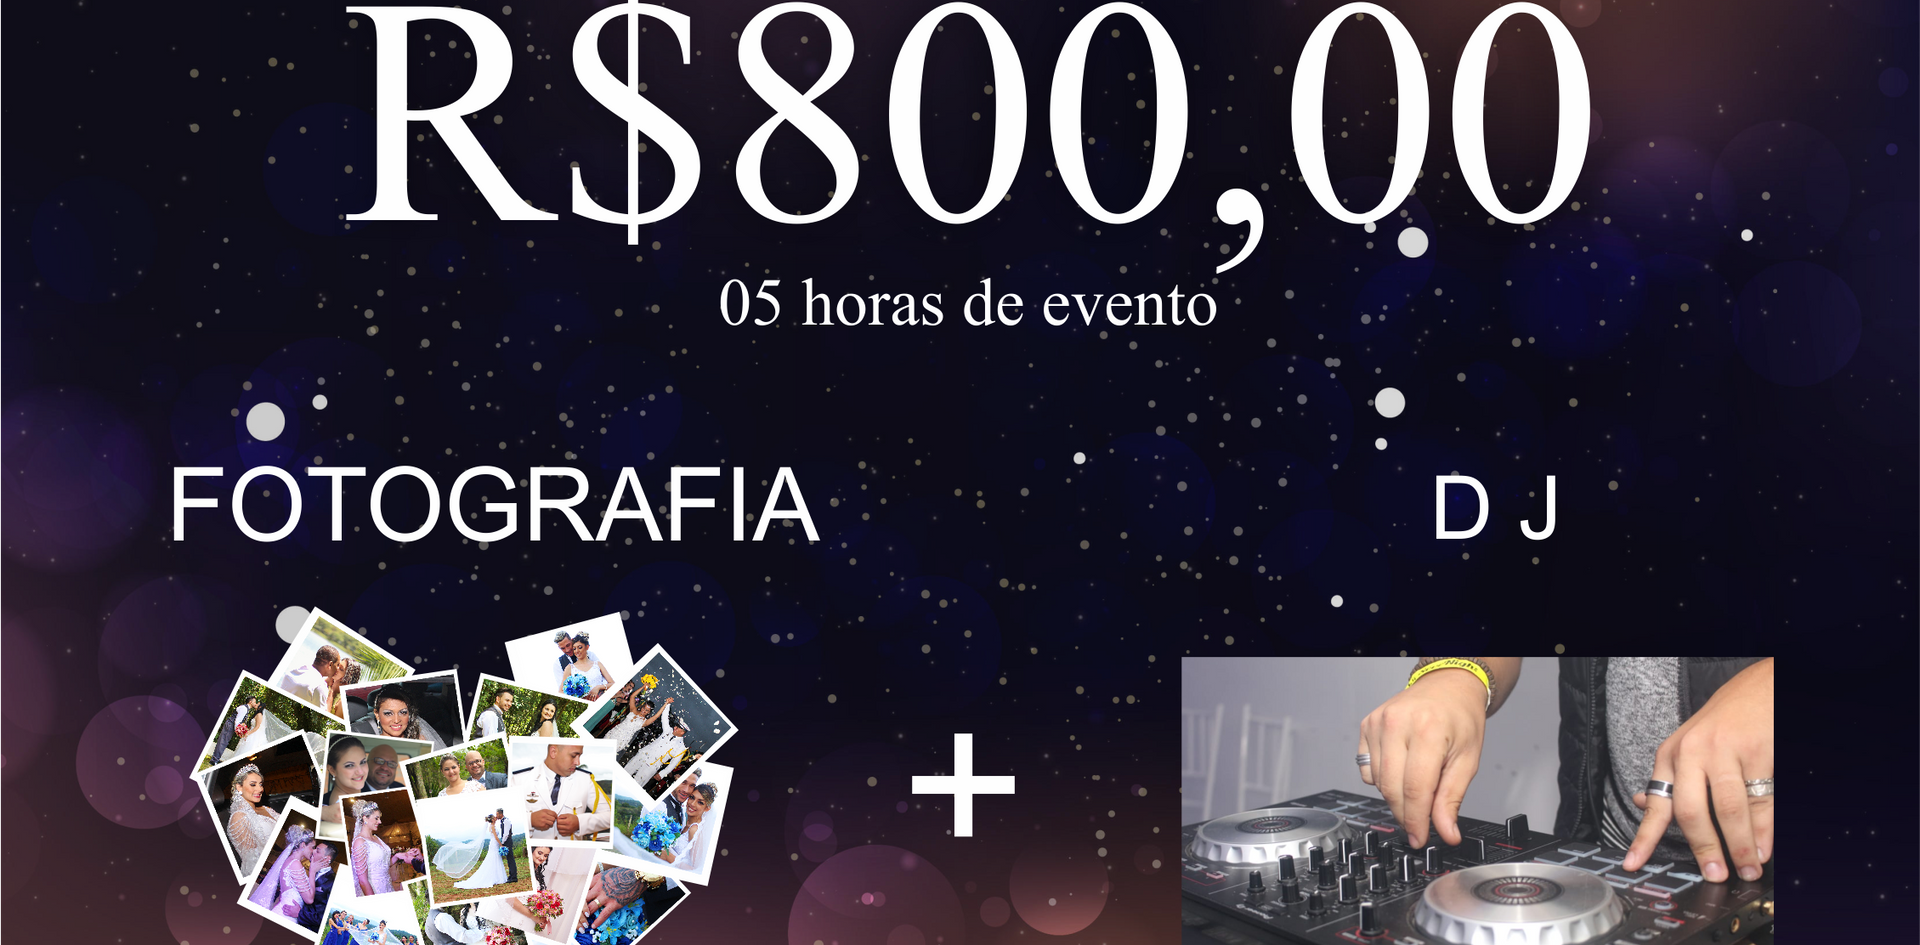 Promoção DJ + Foto.png